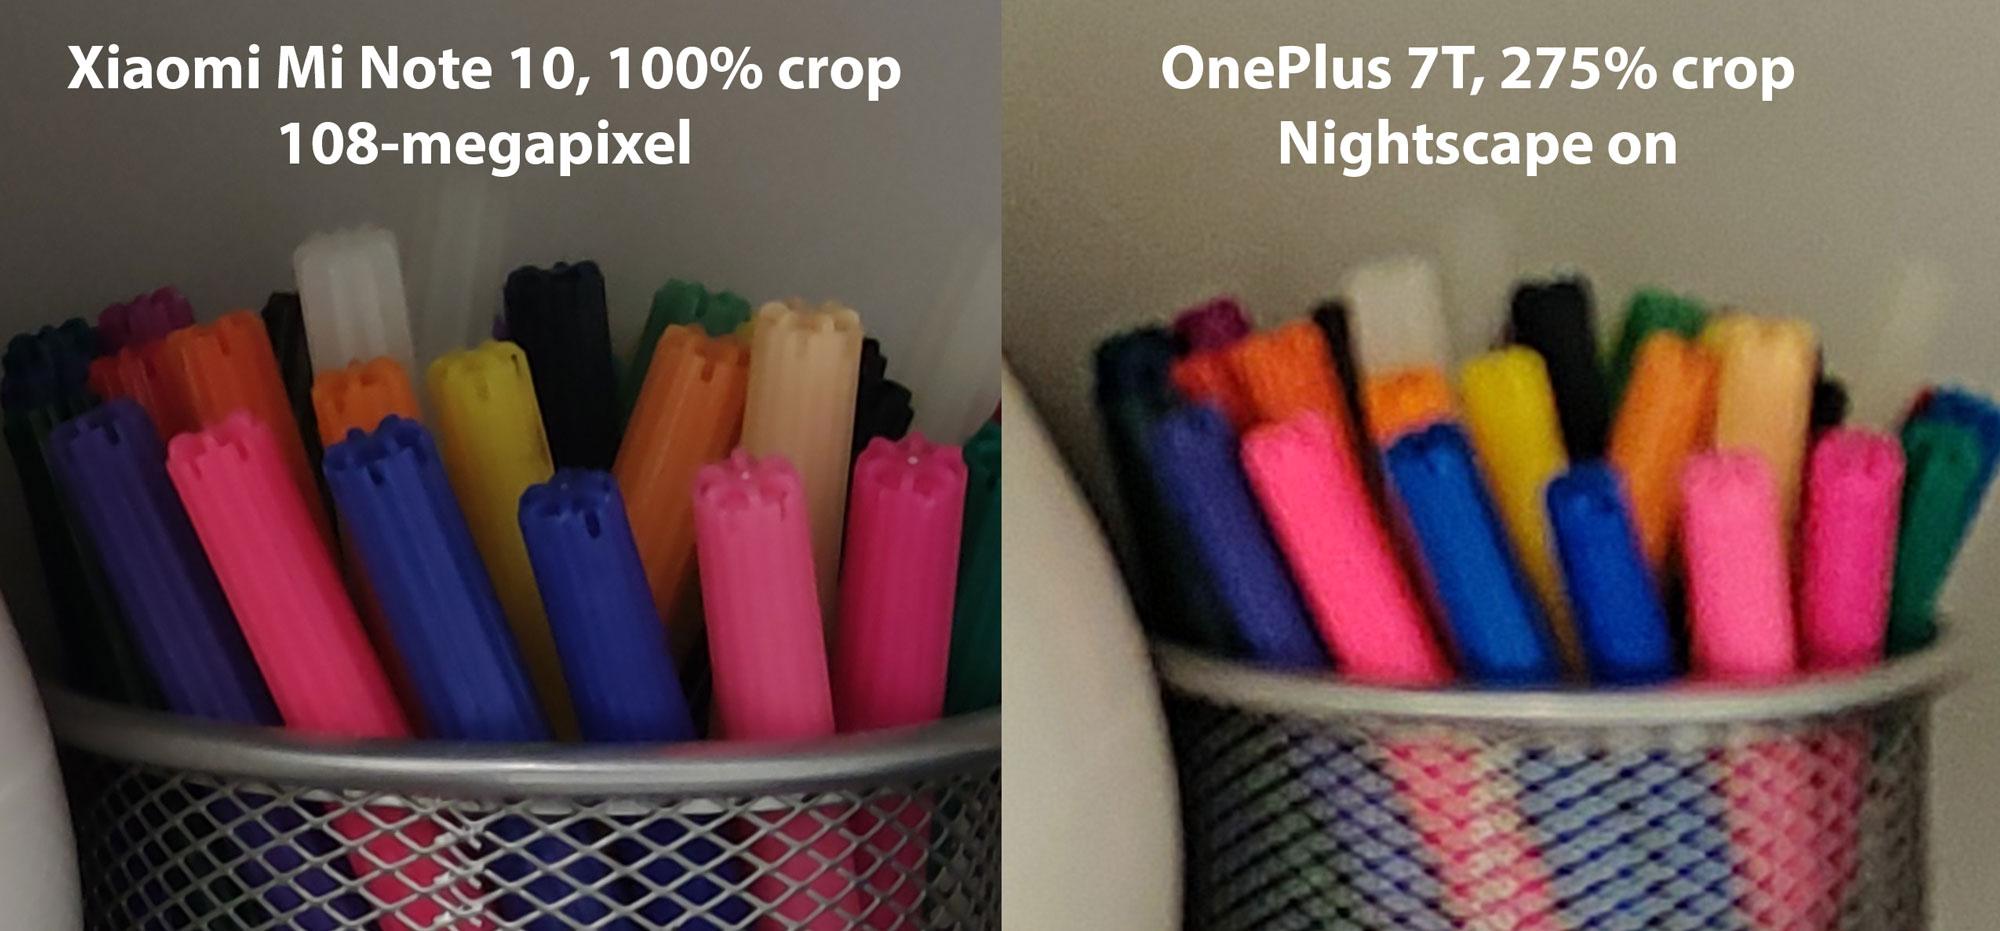 xiaomi-mi-note-10-camra-comparison-oneplus-7t-4.jpg